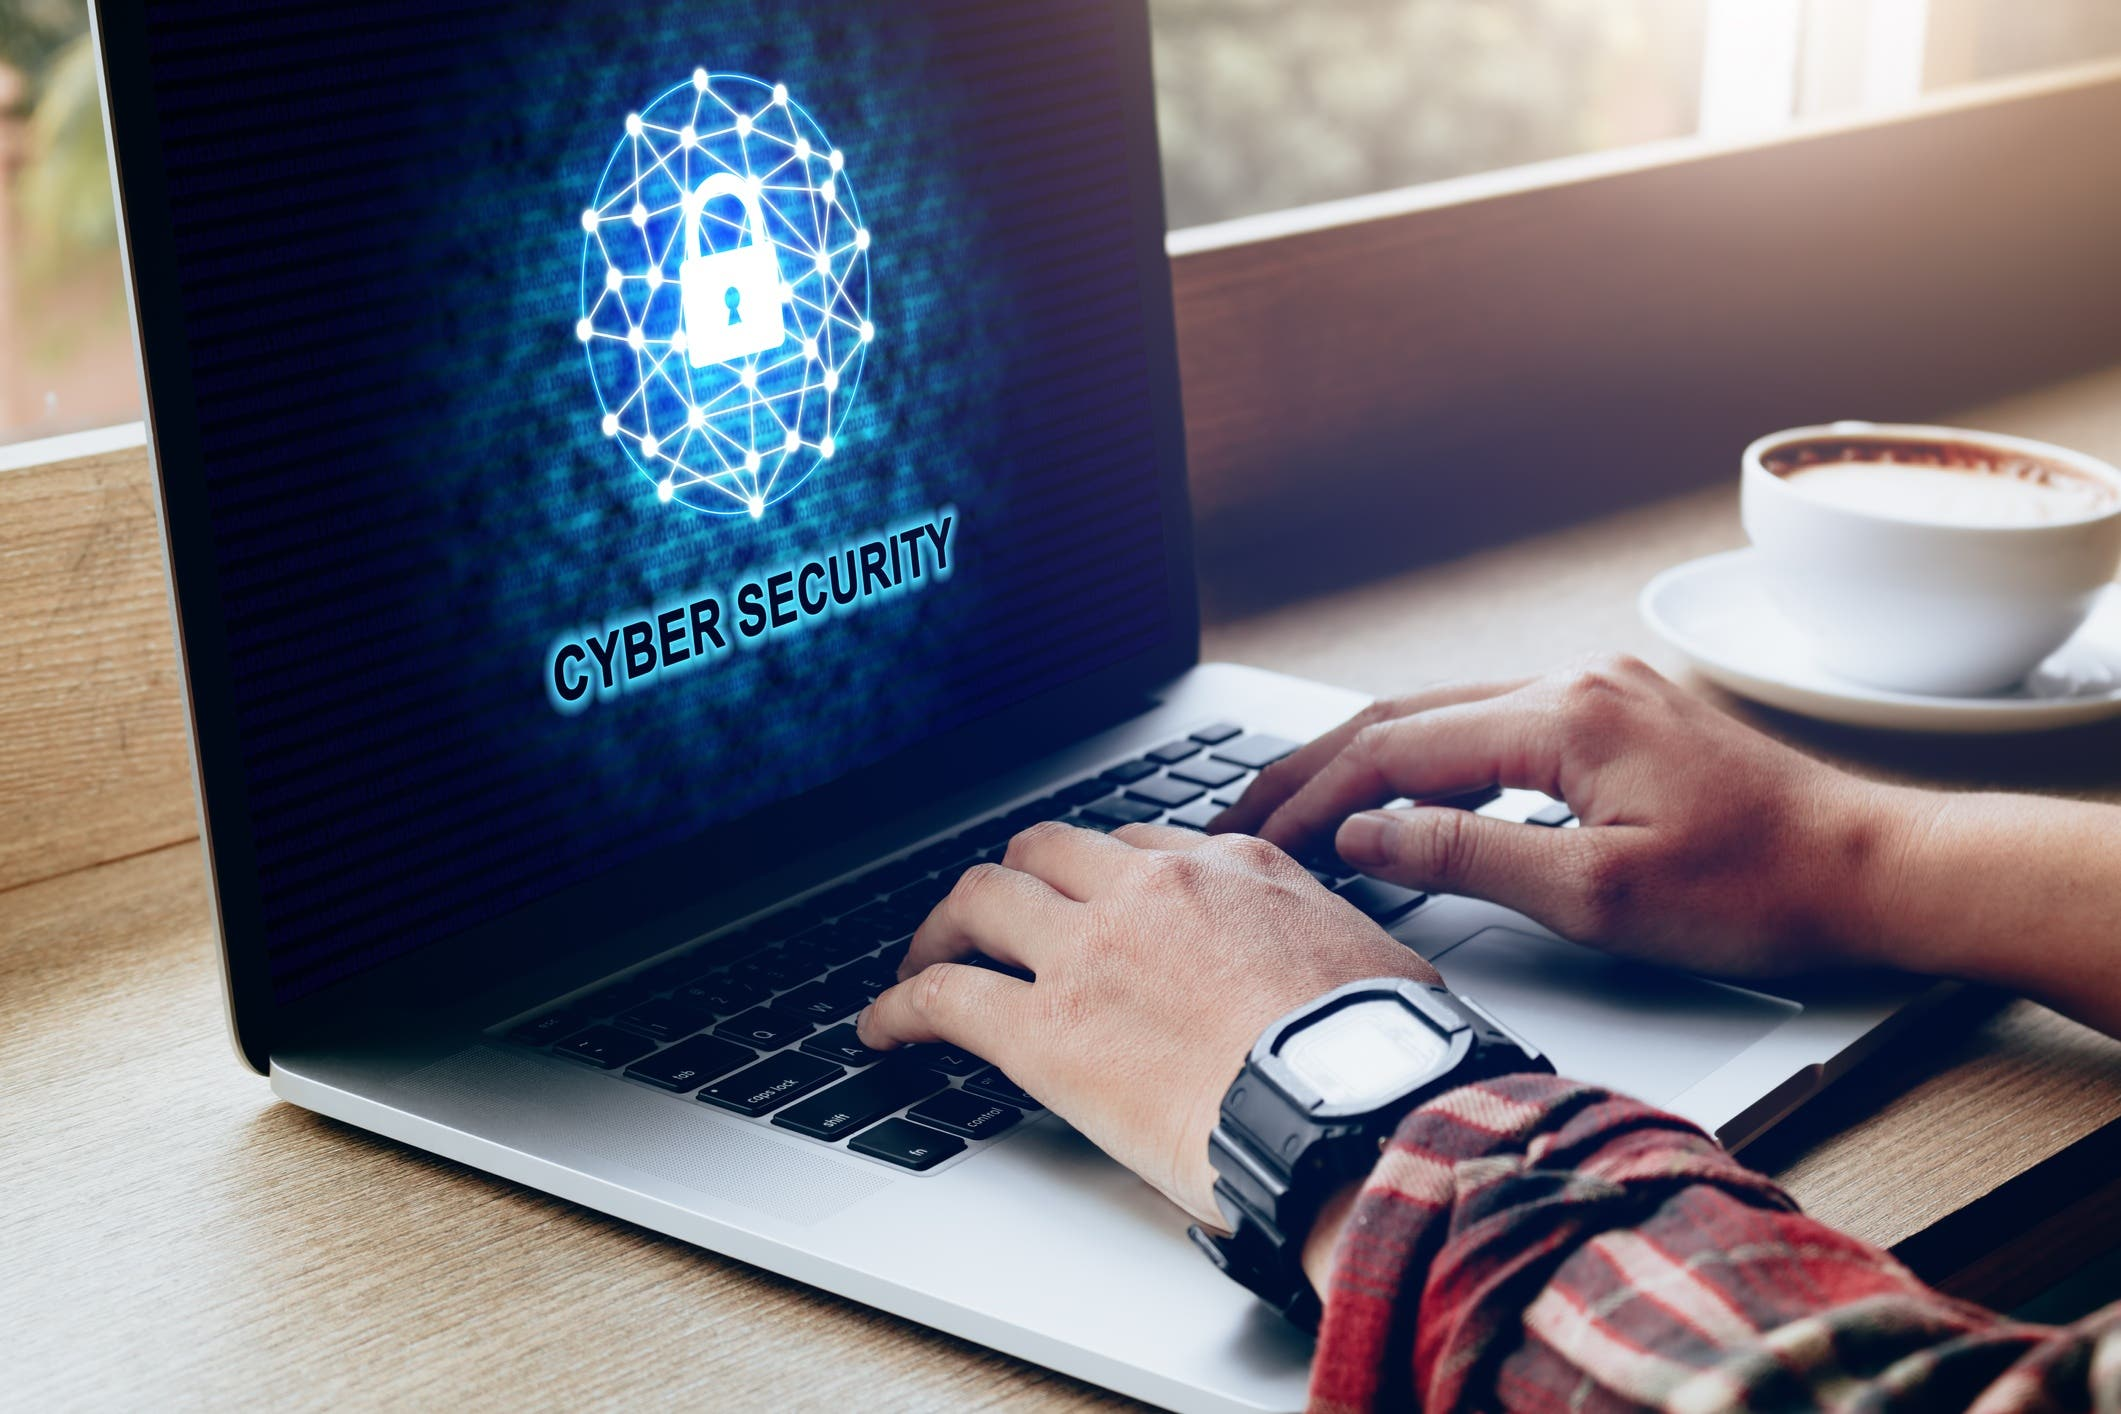 2020 Updated Regulatory Cybersecurity Guidance - Understanding FDIC and OCC Joint Regulatory Statement (2020-09-02)